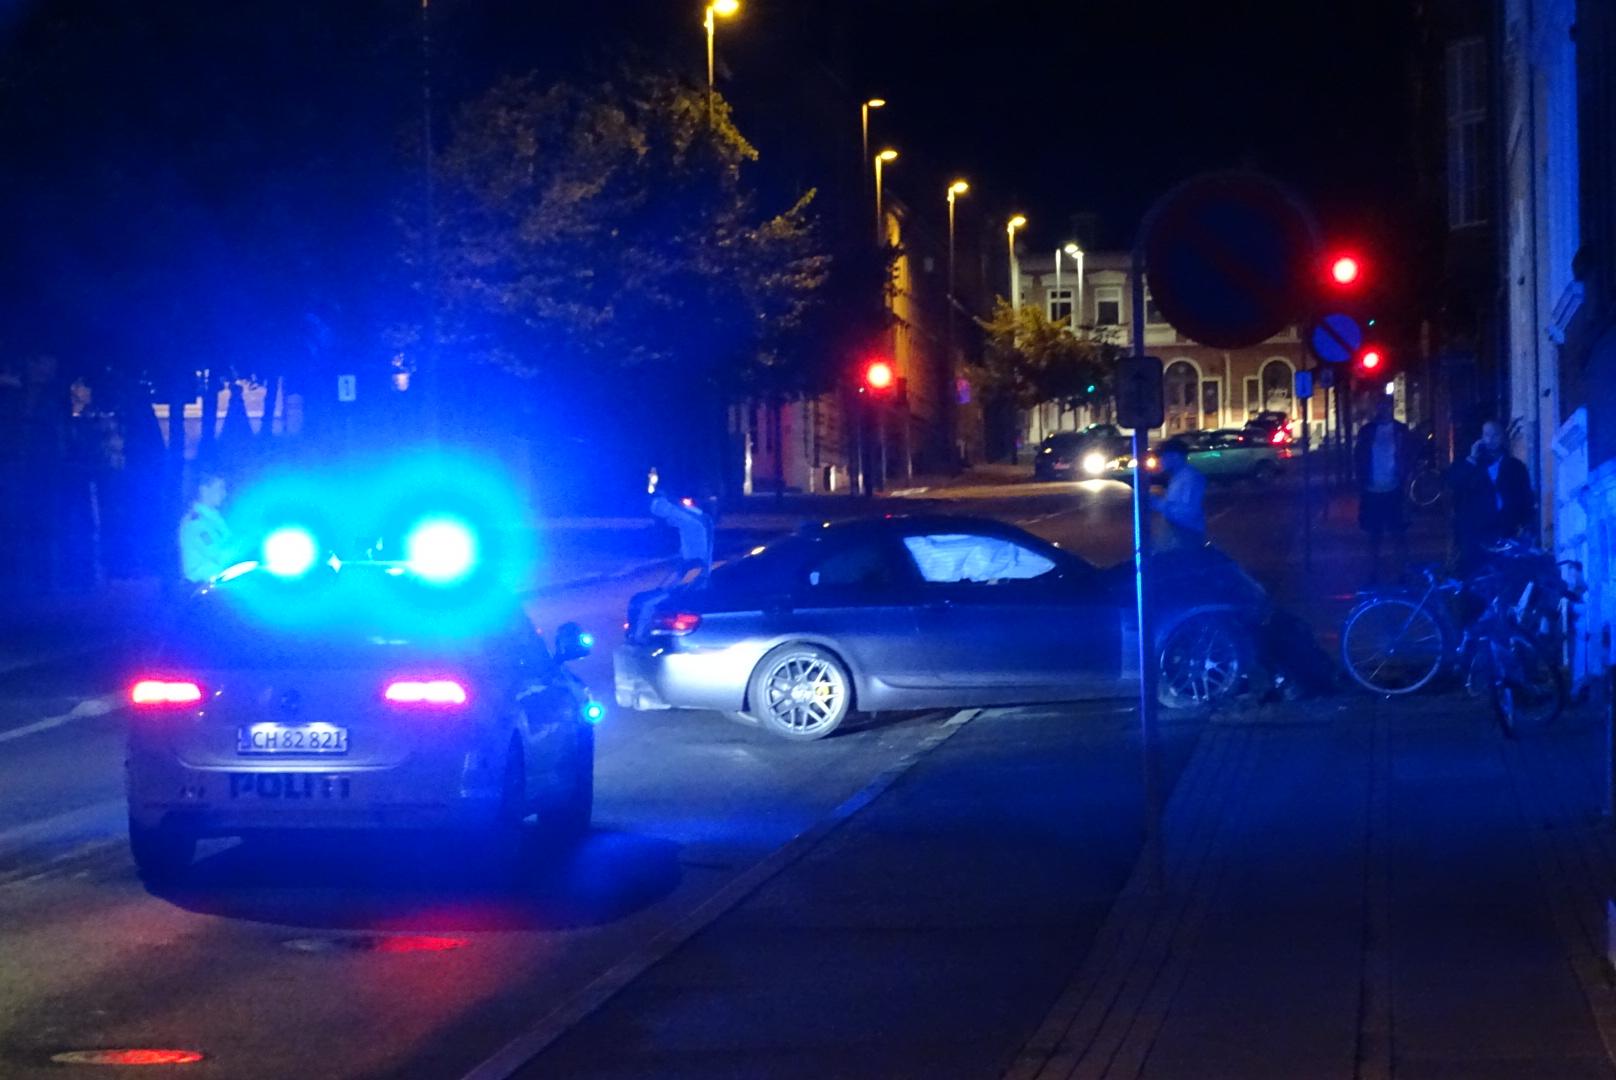 Soloulykke - bilist rammer hus i Horsens